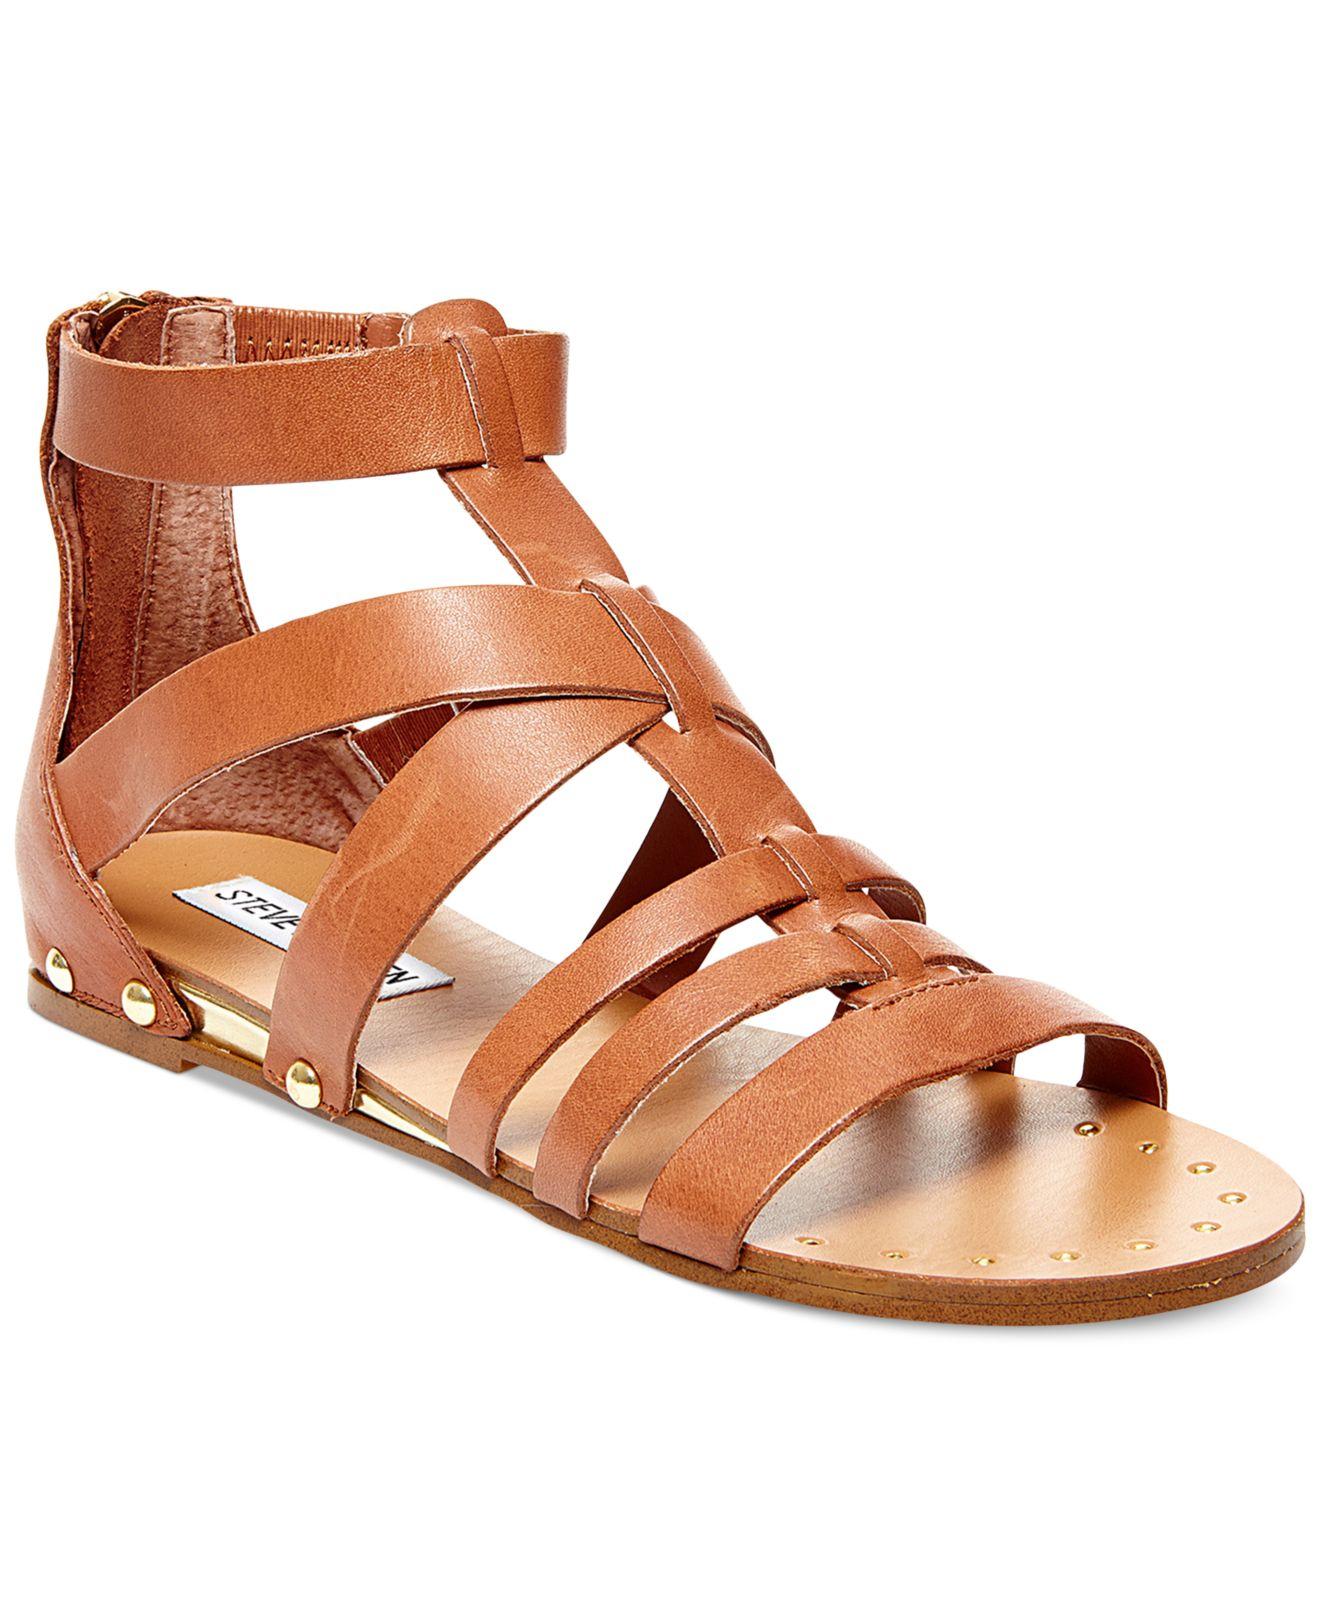 Steve Madden Drastik Leather Gladiator Sandals In Brown Lyst